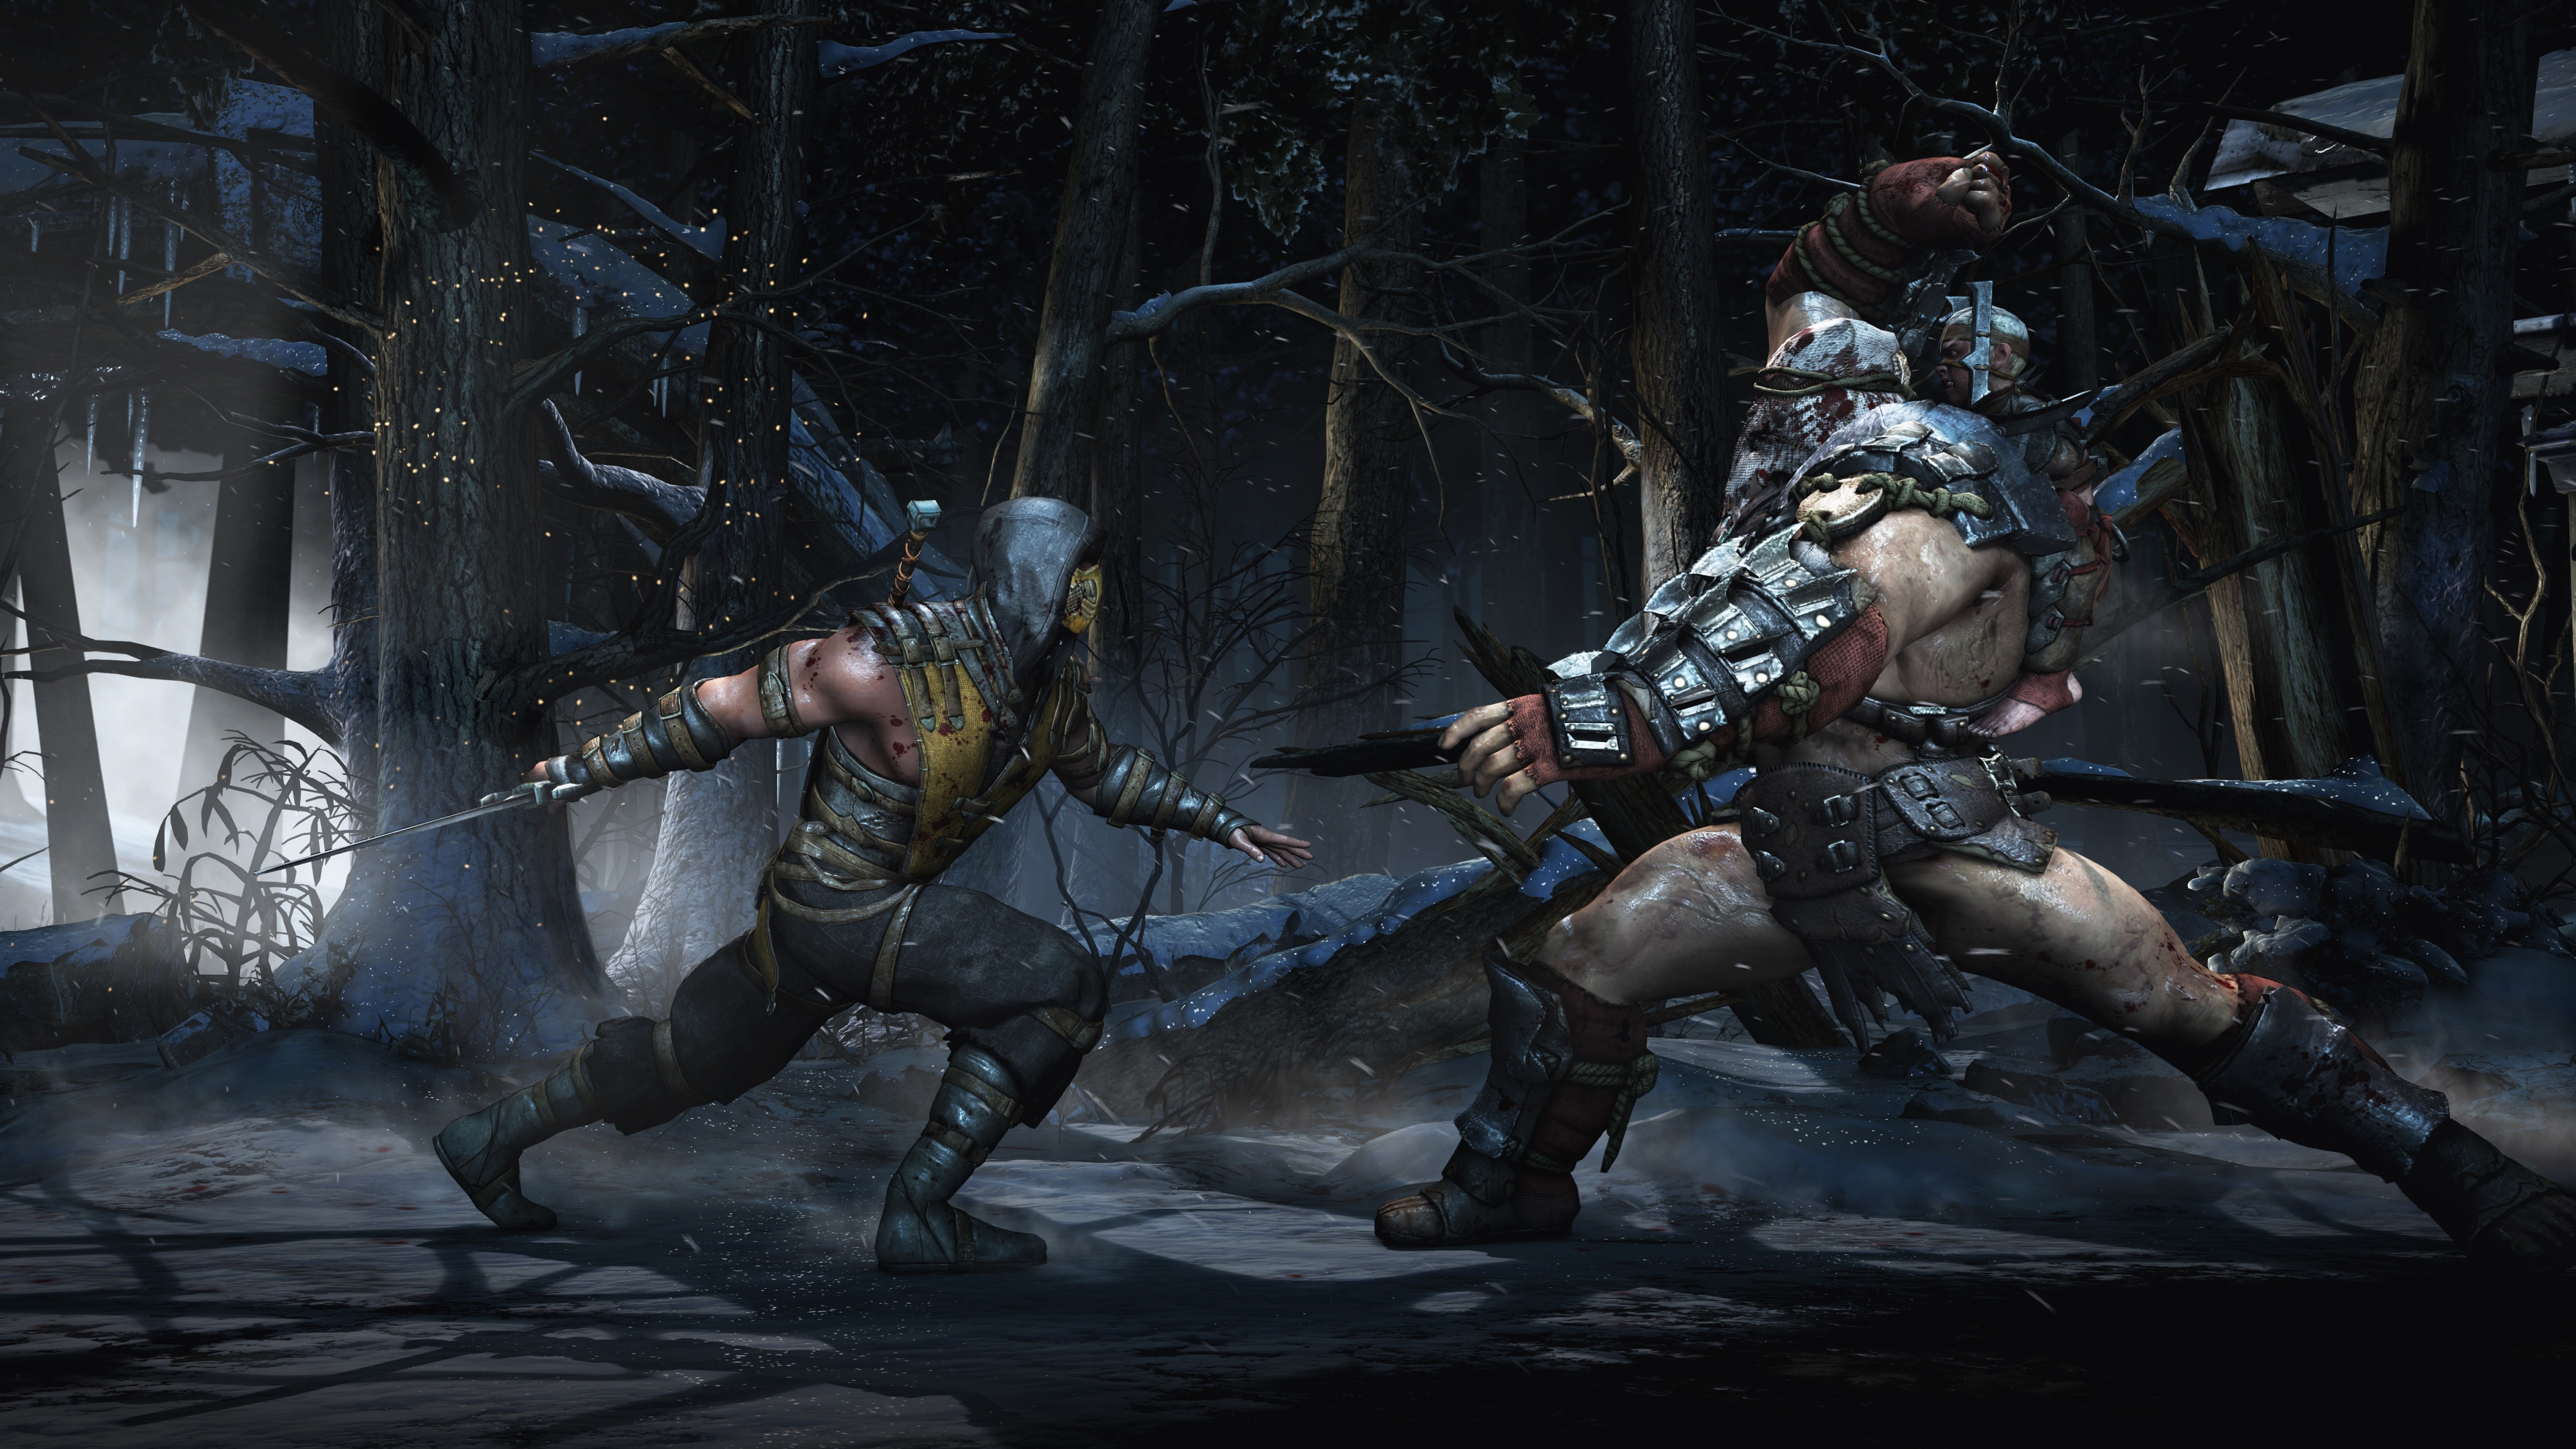 mortal_kombat_x_nice_gameplay